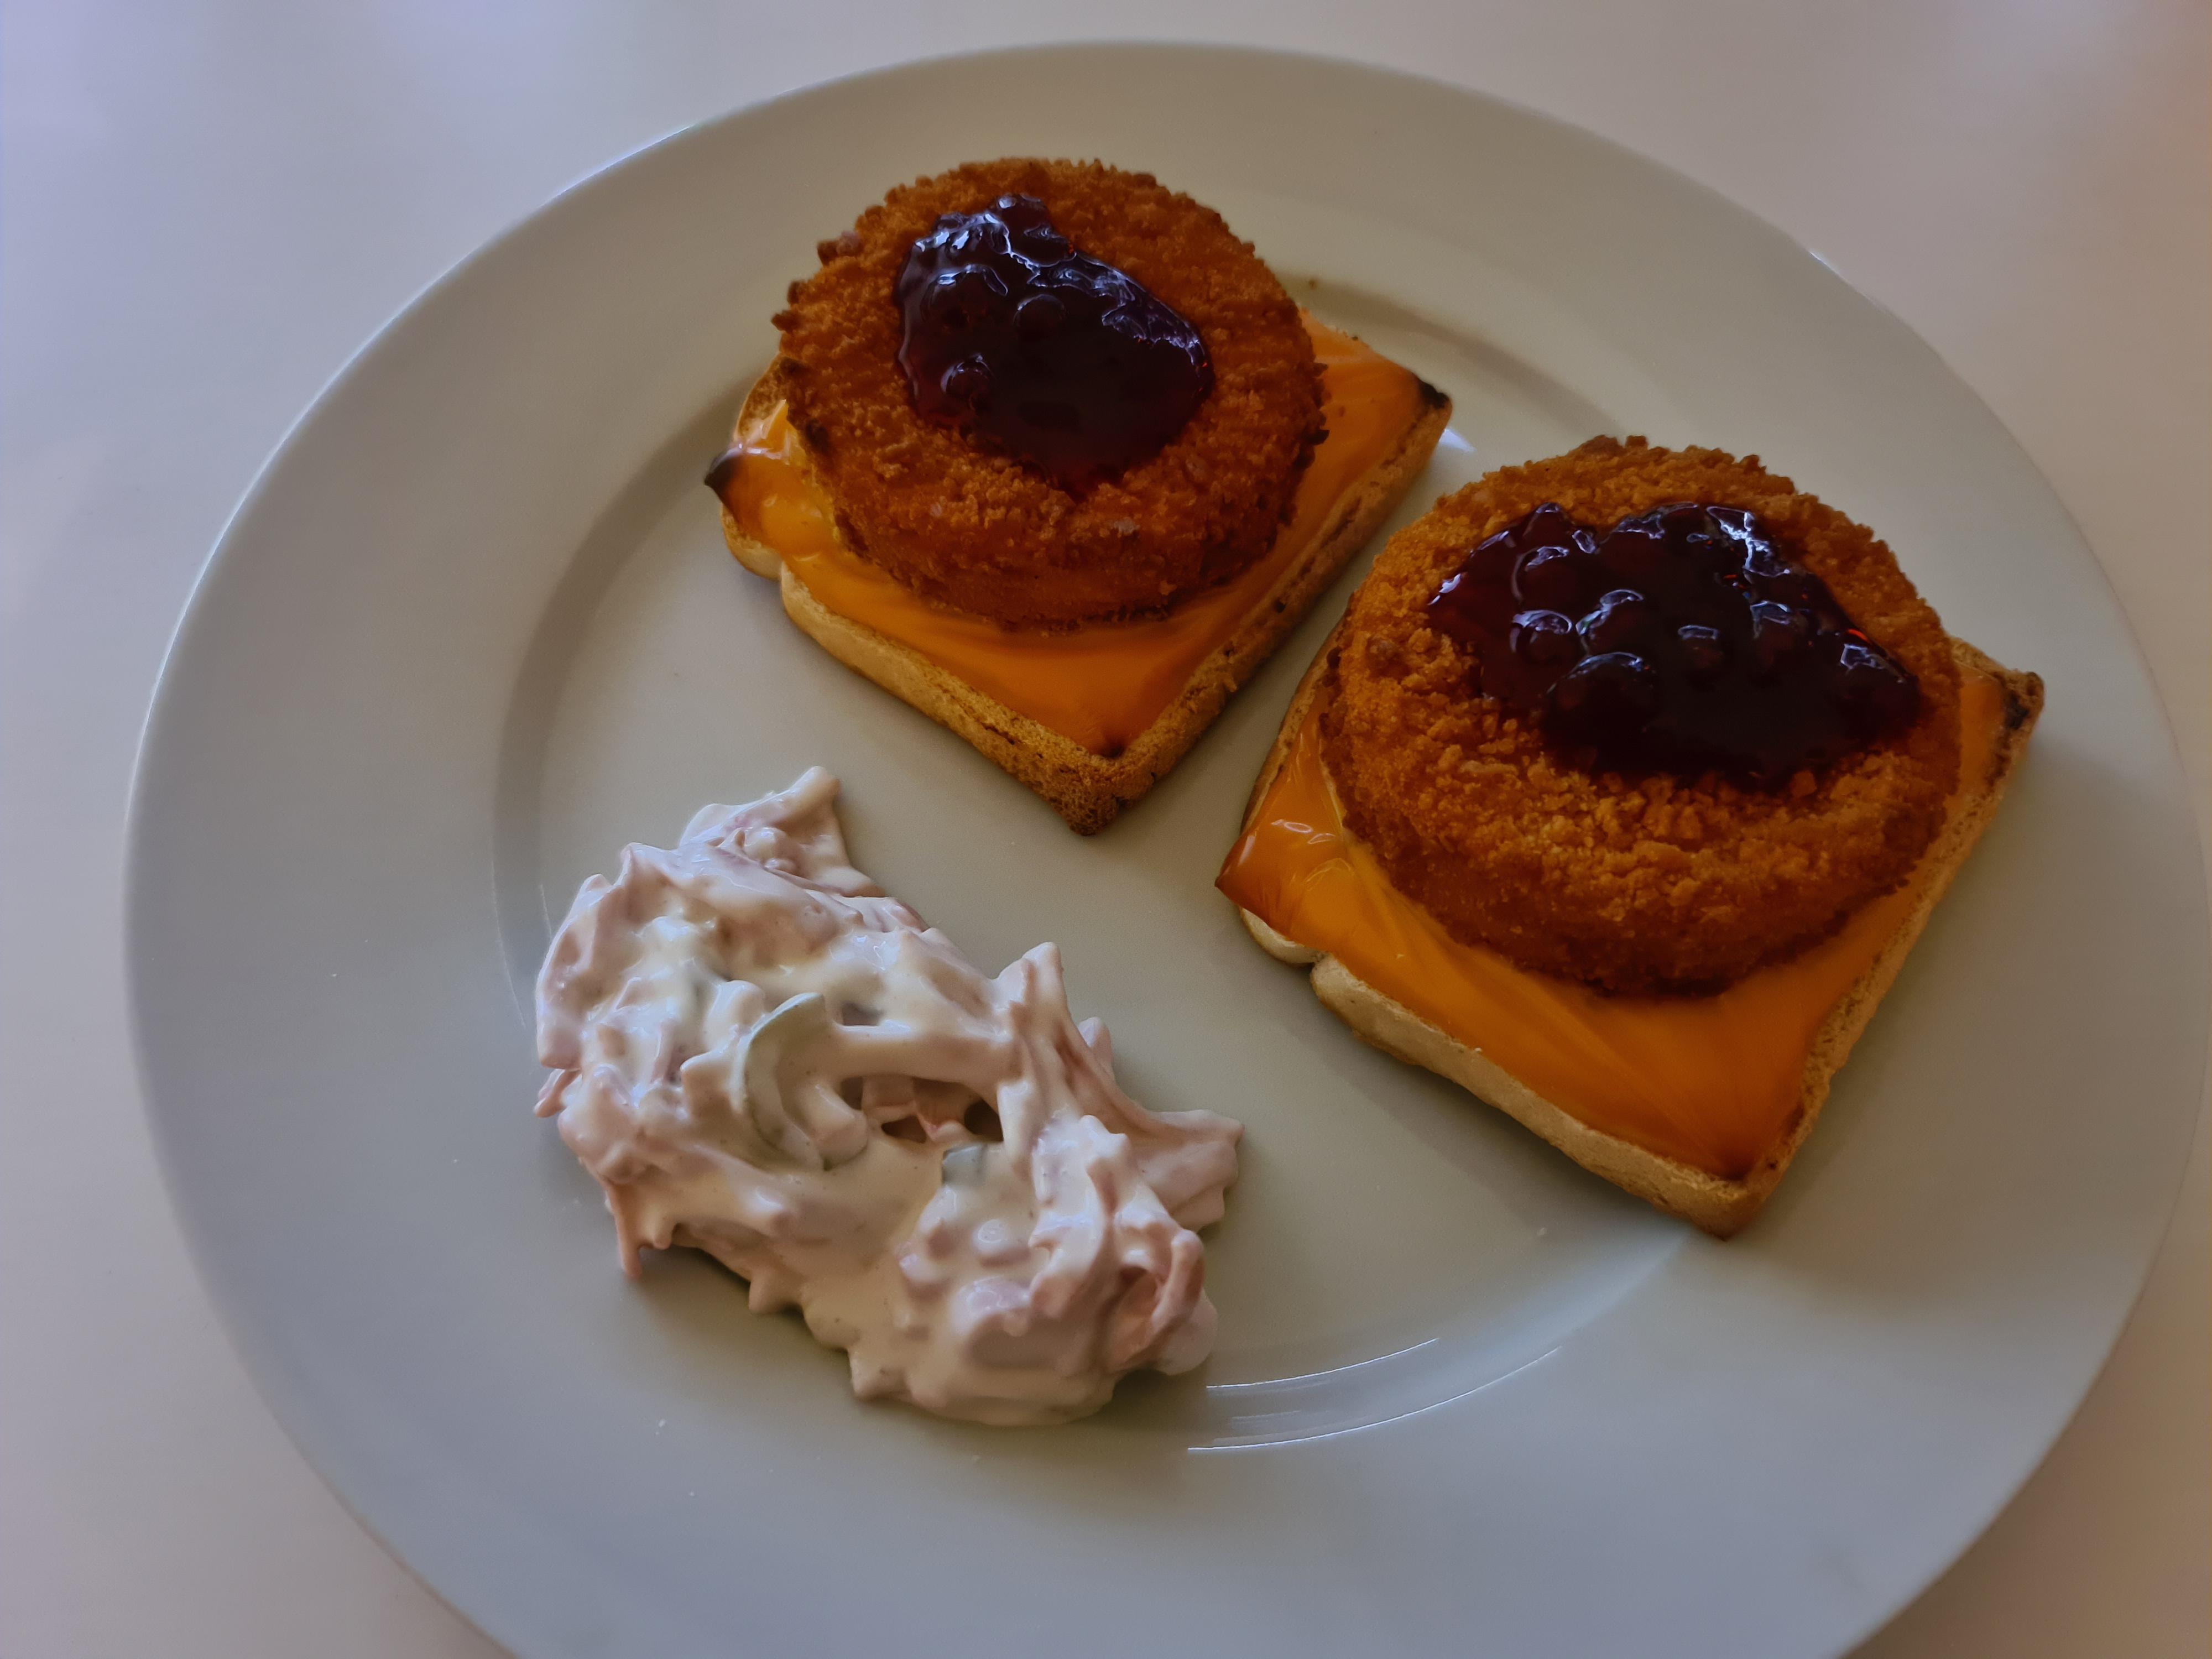 https://foodloader.net/Holz_2020-04-02_Gebackener_Camembert_auf_Toast.jpg